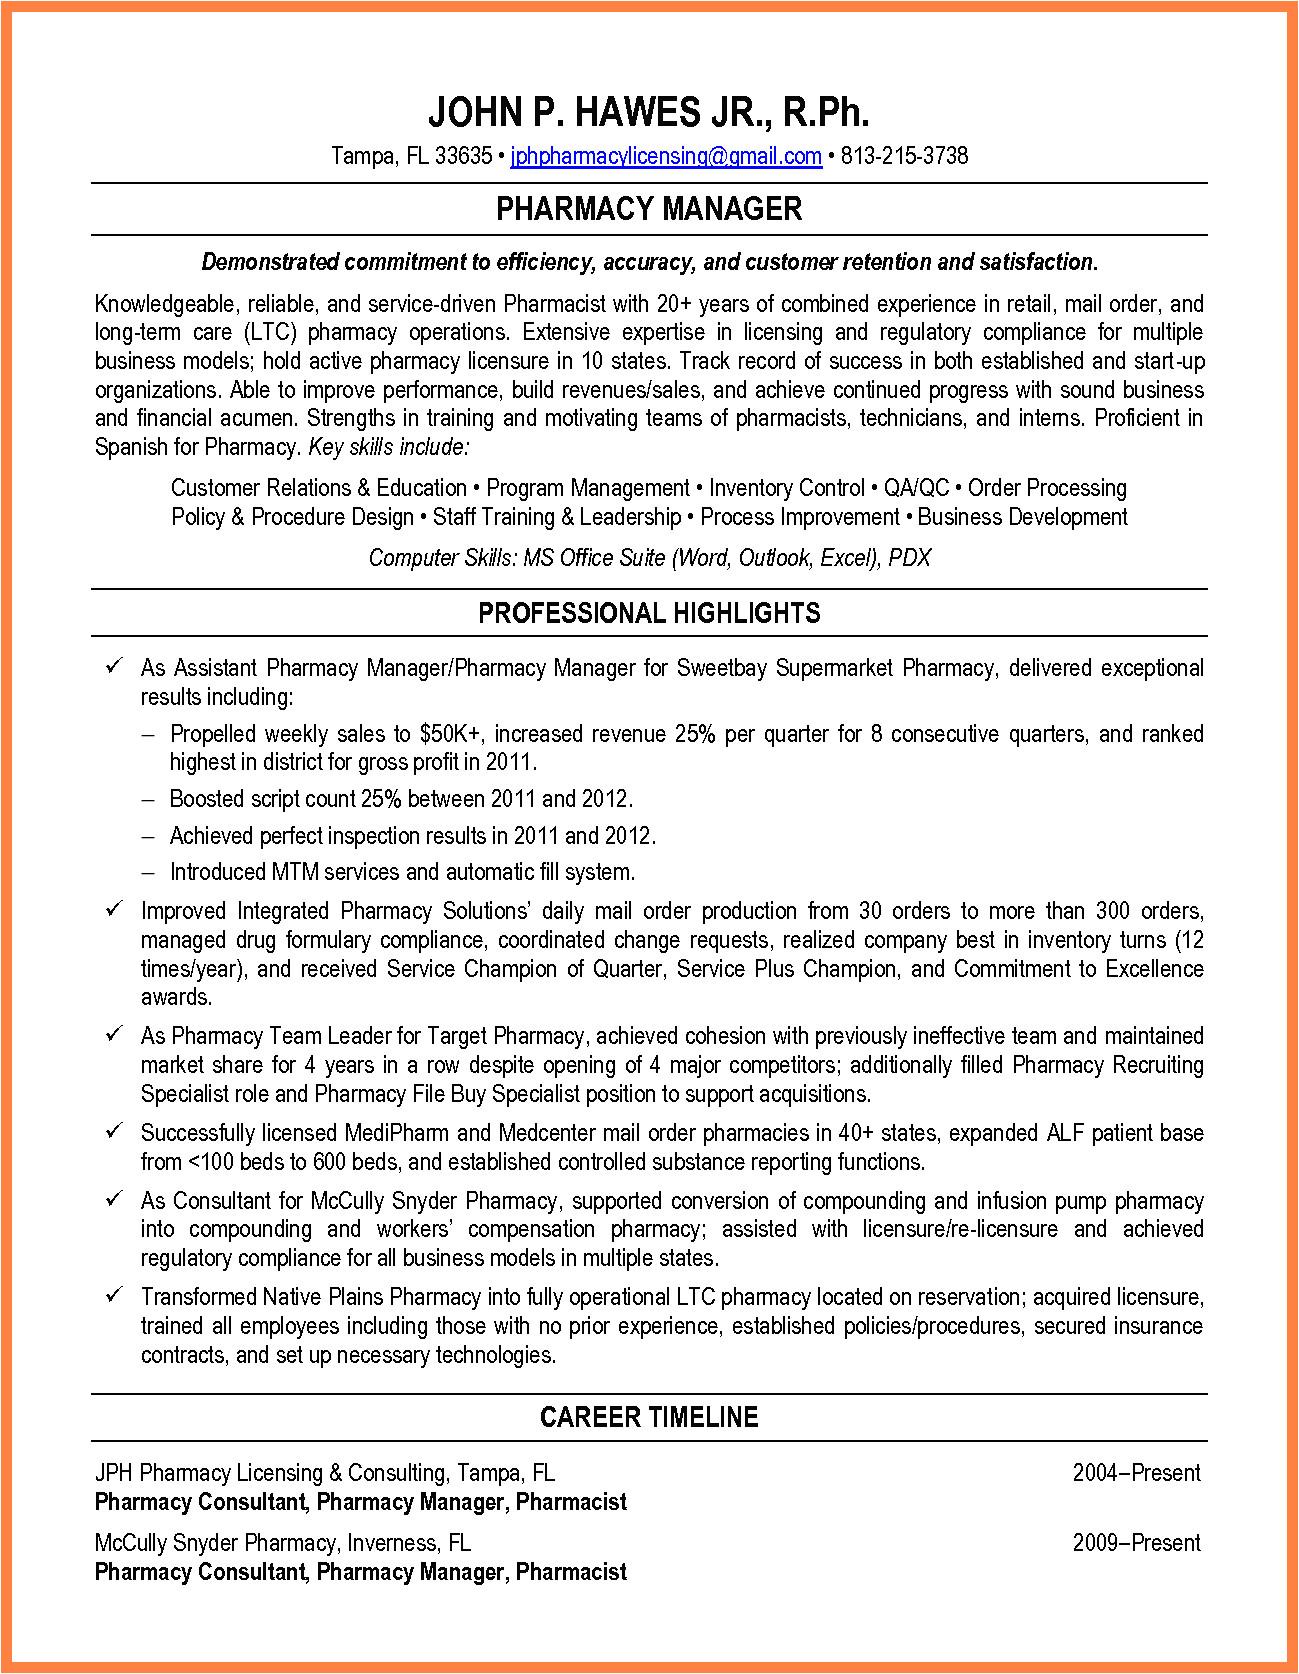 6 resume excel resume for a pharmacist